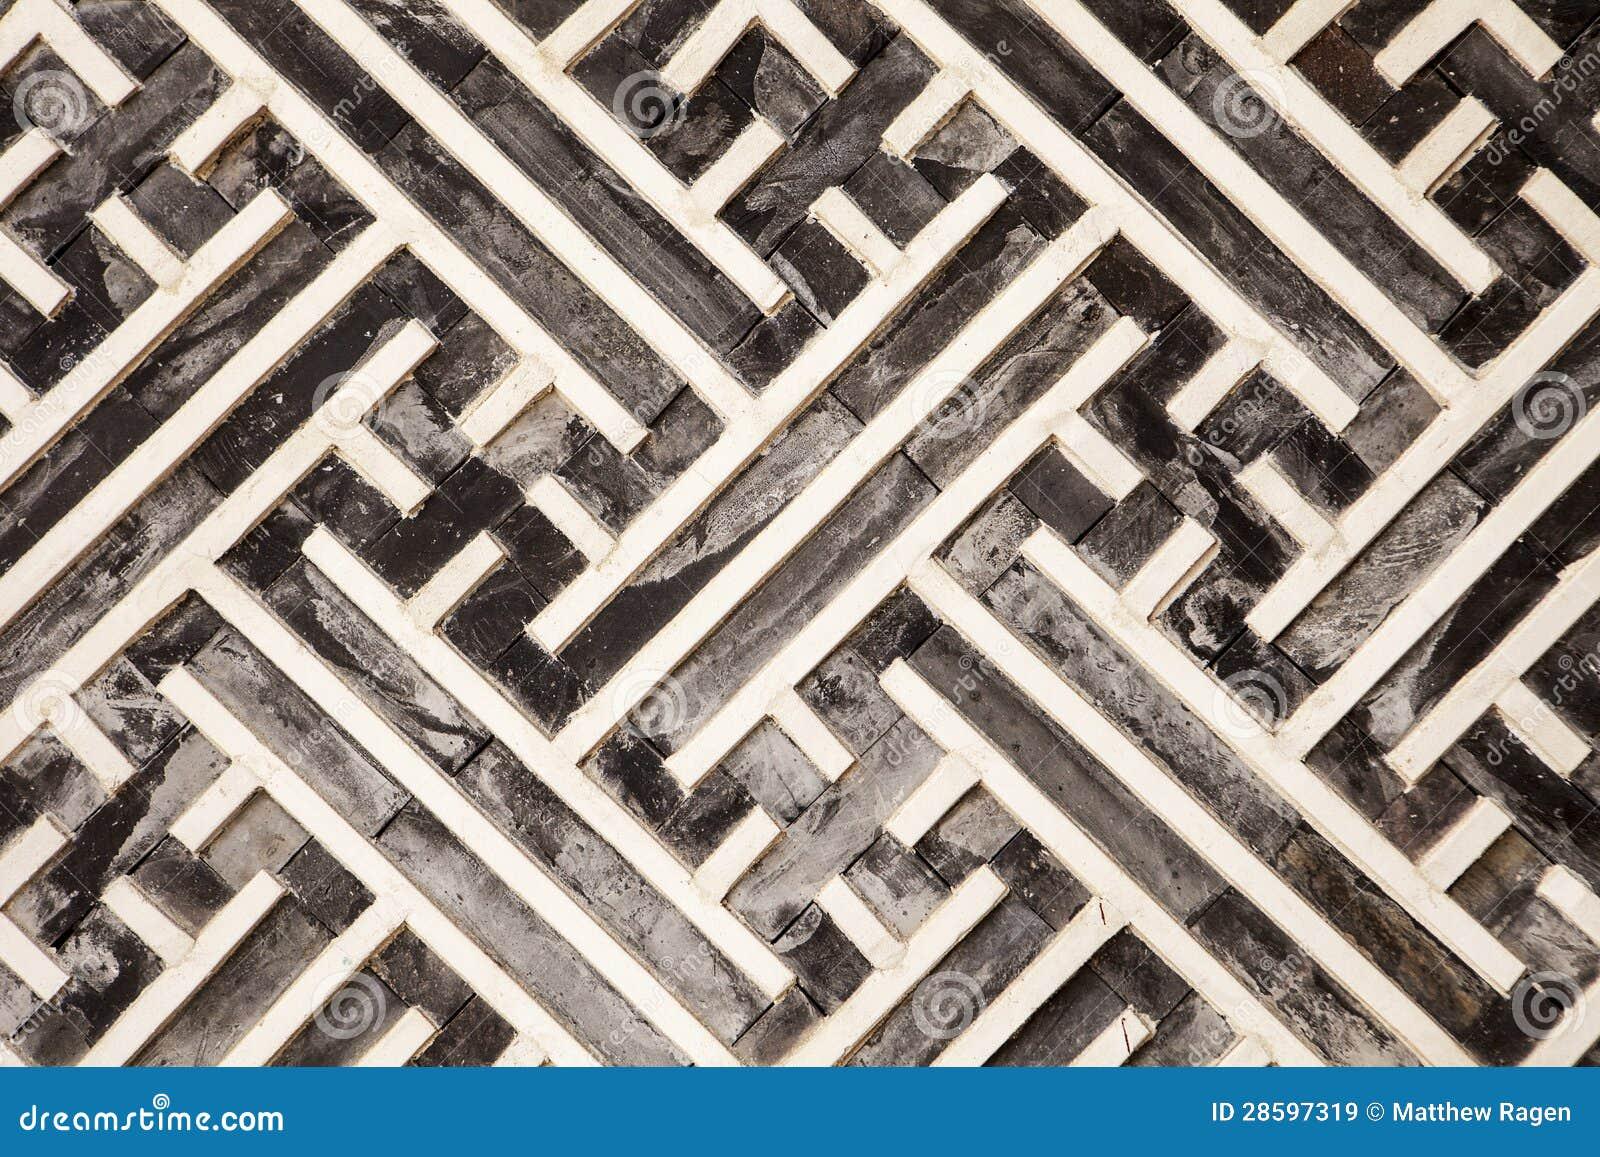 Korean Geometric Pattern In Wood Stock Image - Image: 28597319